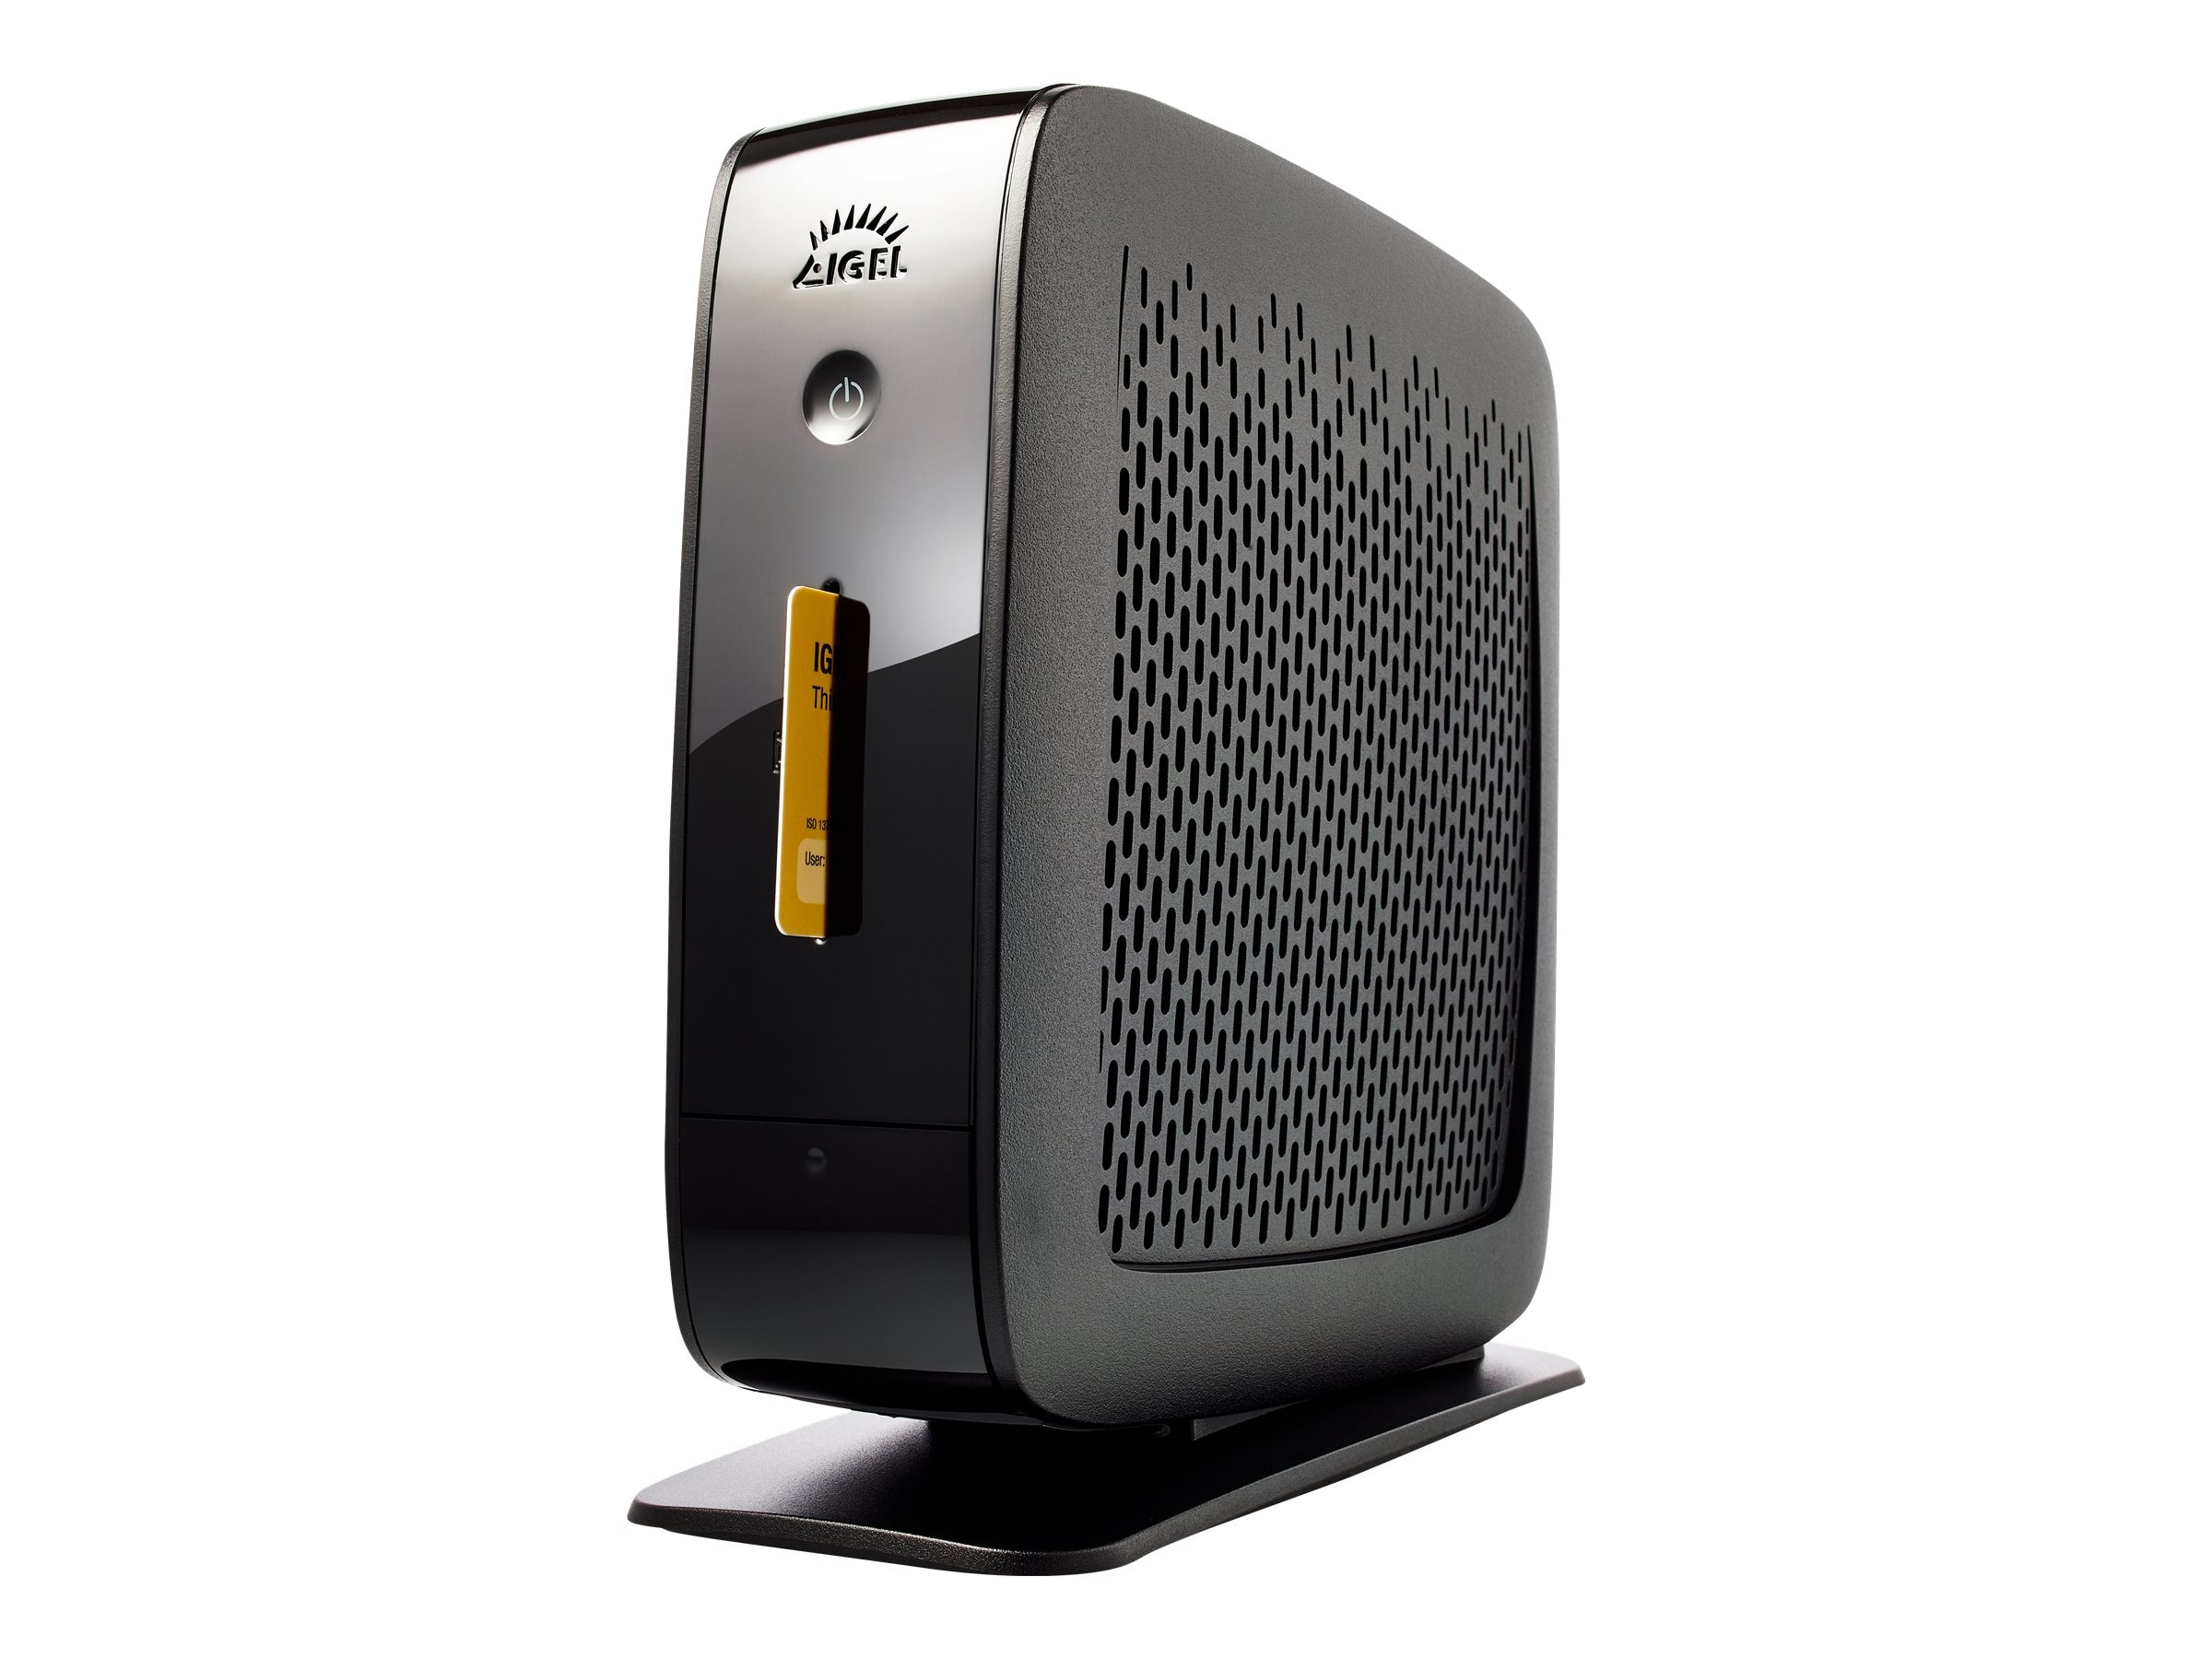 IGEL Technology 62-UD5-W750-34BL Image 2